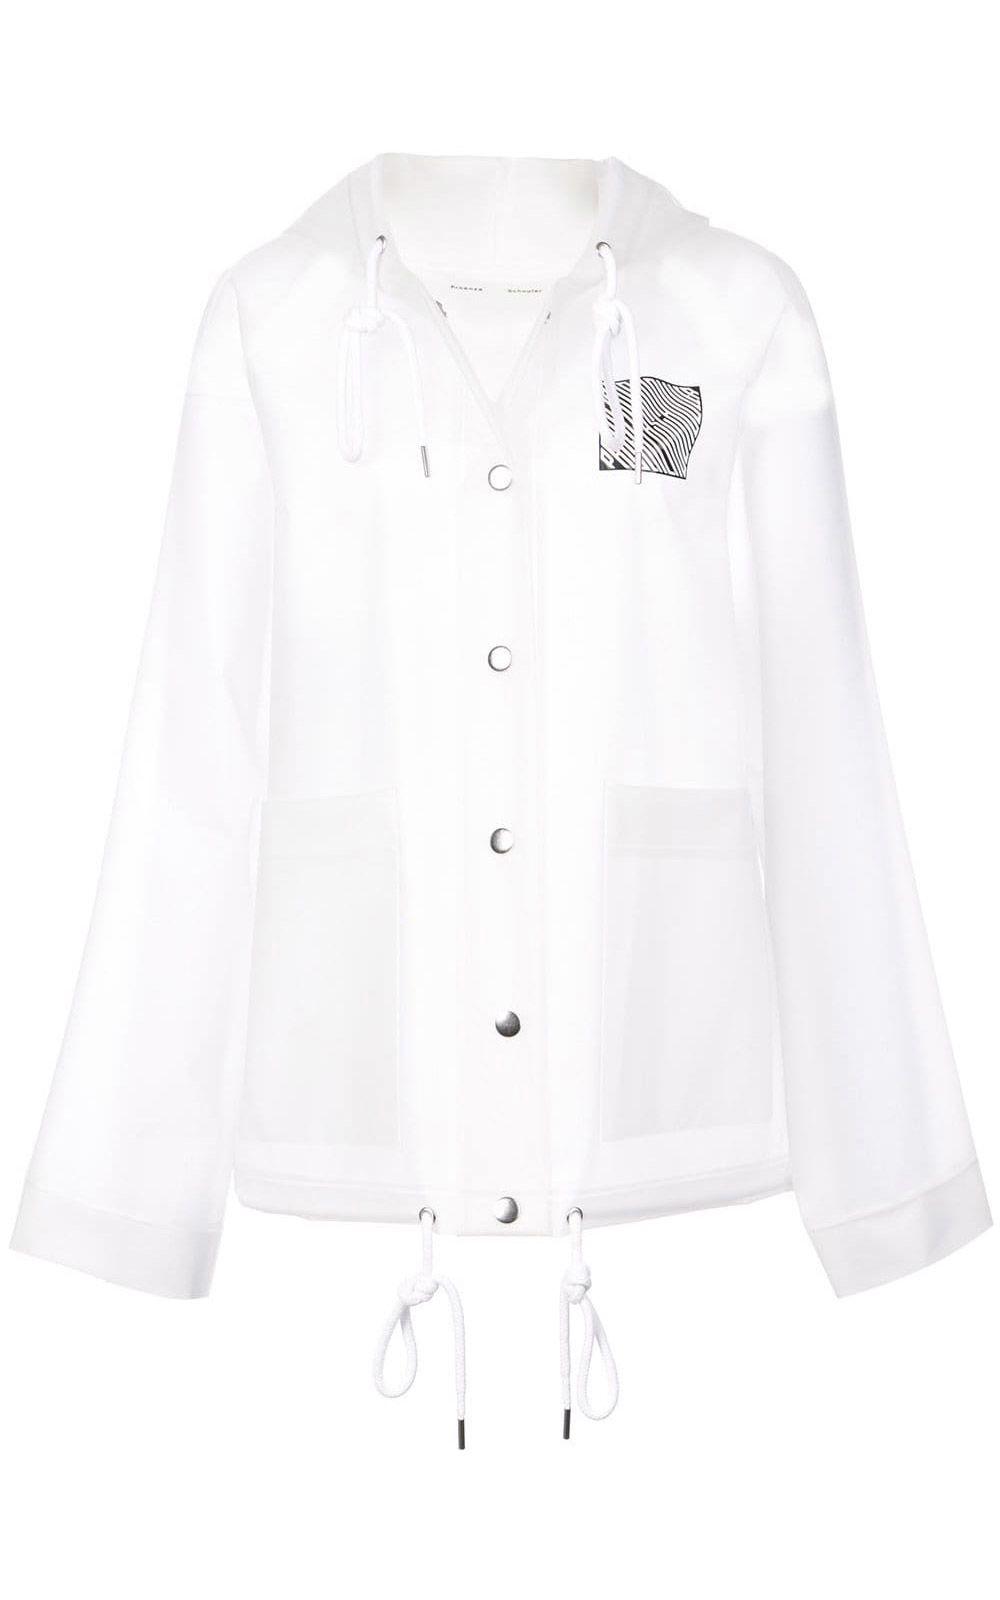 proenza schouler -  Pswl Care Label Raincoat